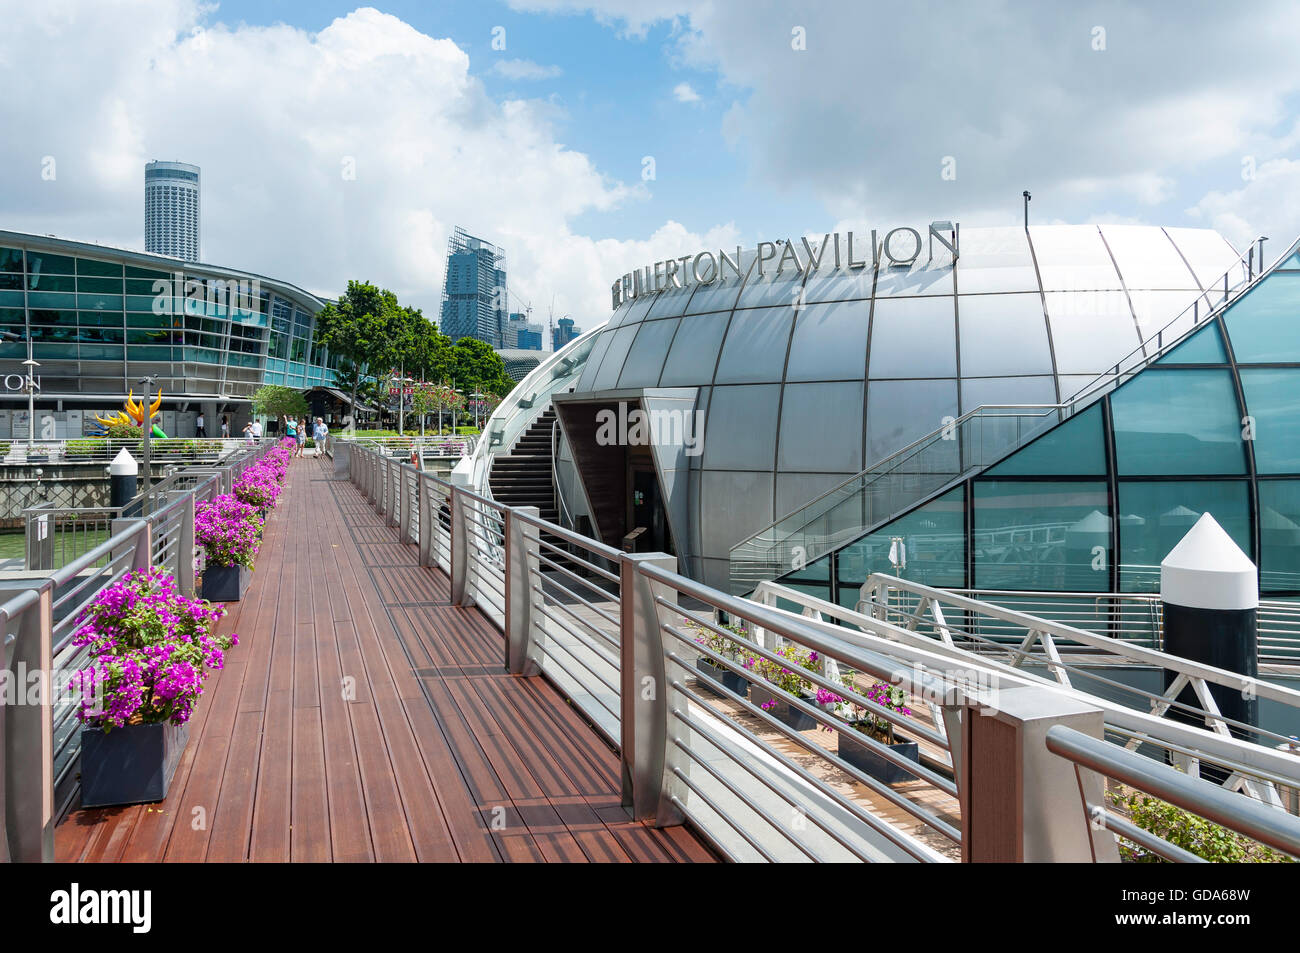 The Fullerton Pavilion, Clifford Square, Marina Bay, Central Area, Singapore Island (Pulau Ujong), Singapore - Stock Image